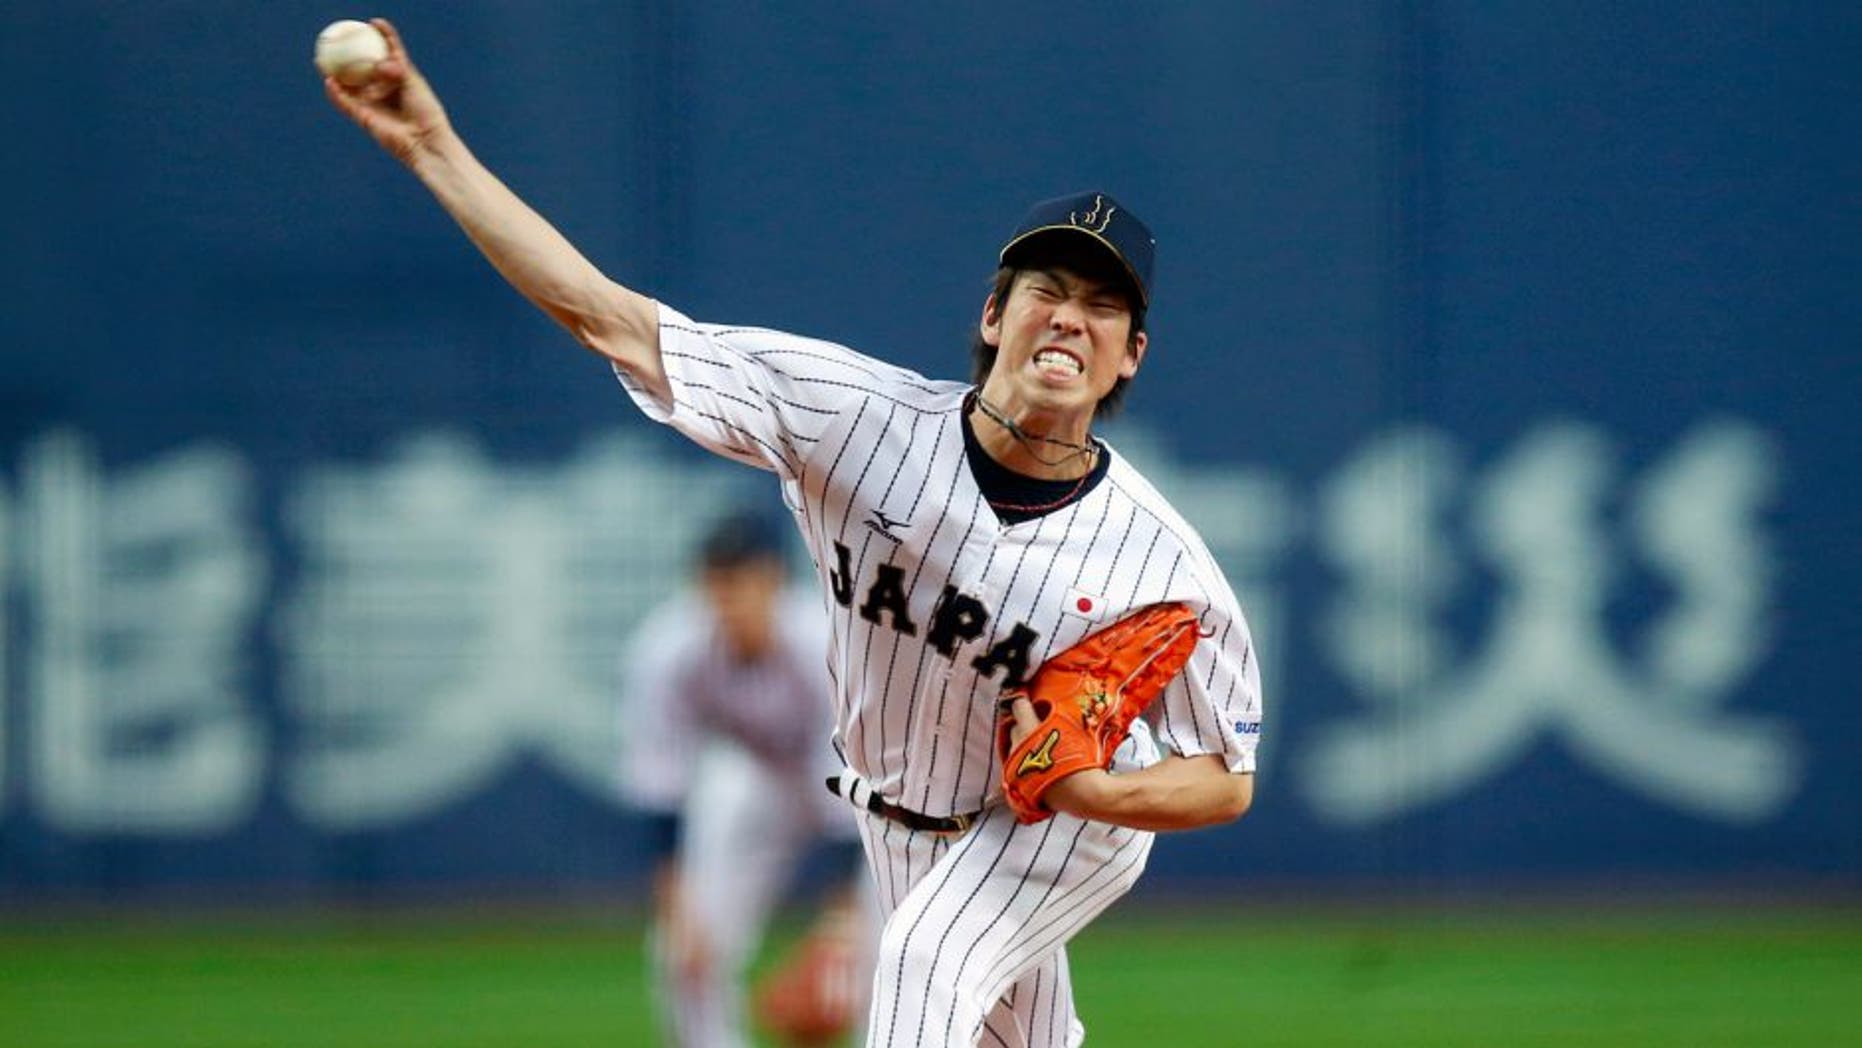 OSAKA, JAPAN - NOVEMBER 12: Kenta Maeda #18 of Samurai Japan pitches in the second inning against the MLB All-Stars at the Kyocera Dome during the Japan All-Star Series on Wednesday, November 12, 2014 in Osaka, Japan. (Photo by Yuki Taguchi/MLB Photos)